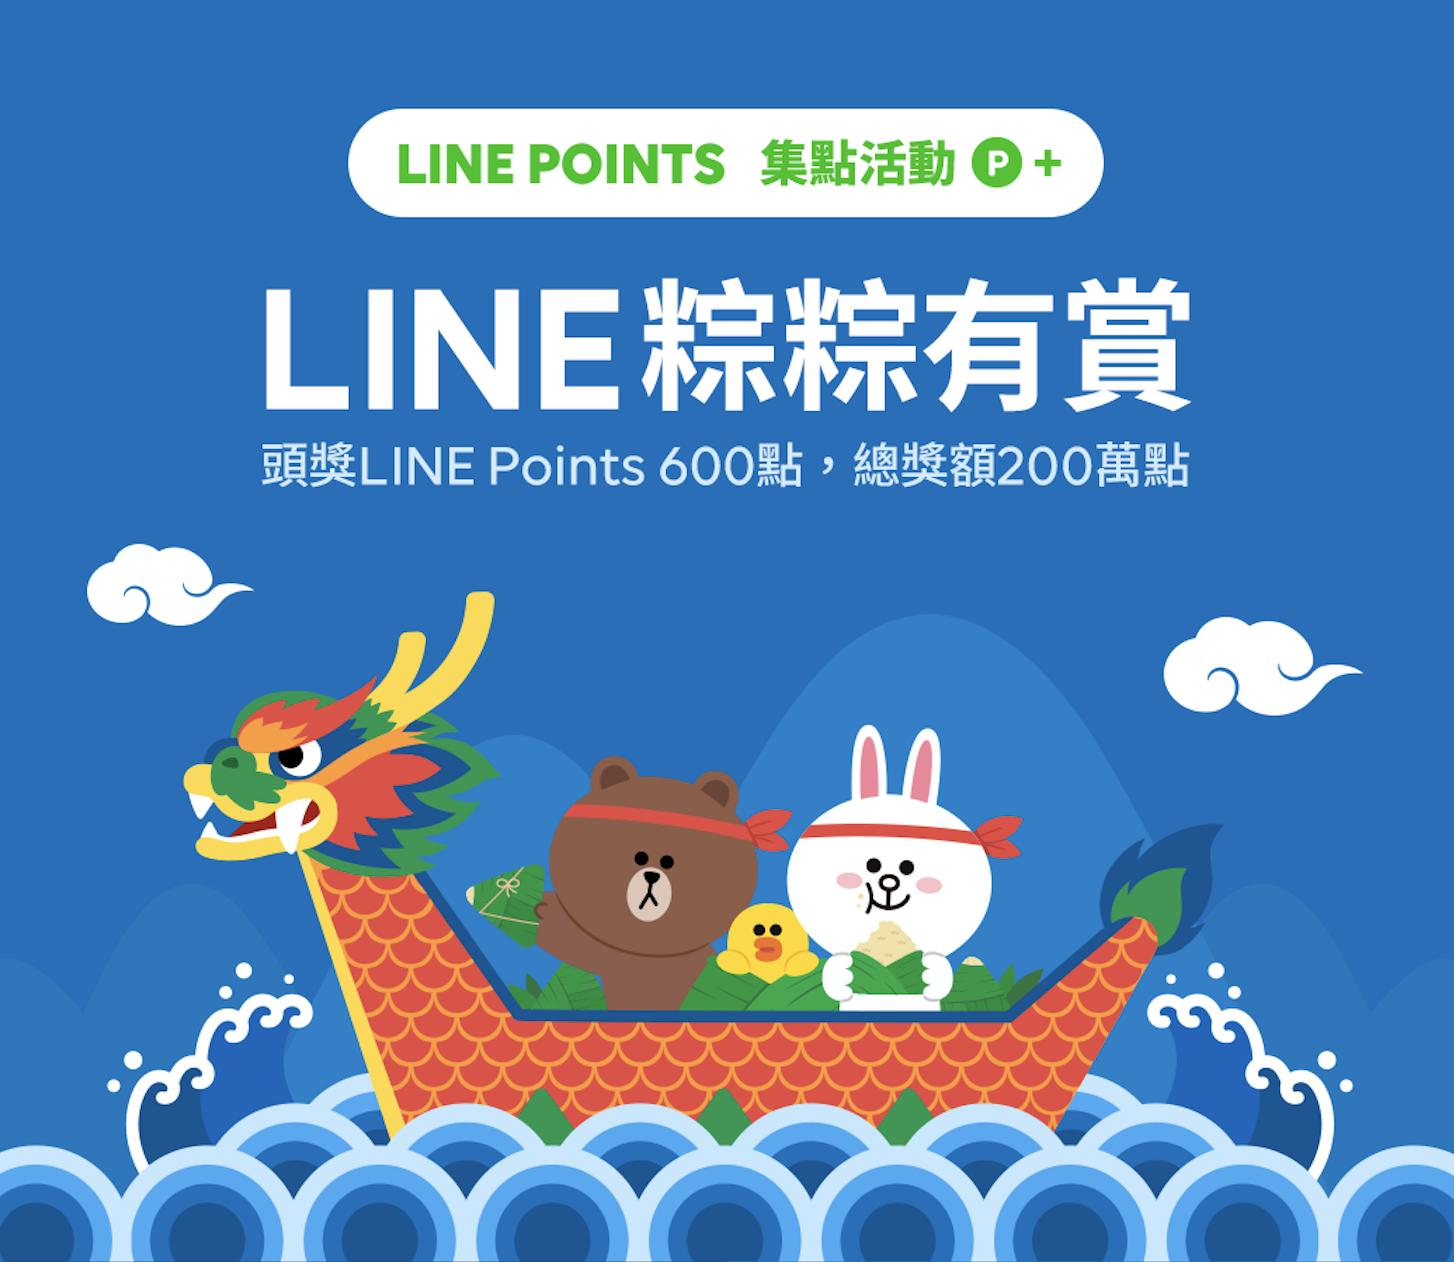 /stf/linecorp/zh-hant/pr/20180614zh1.png